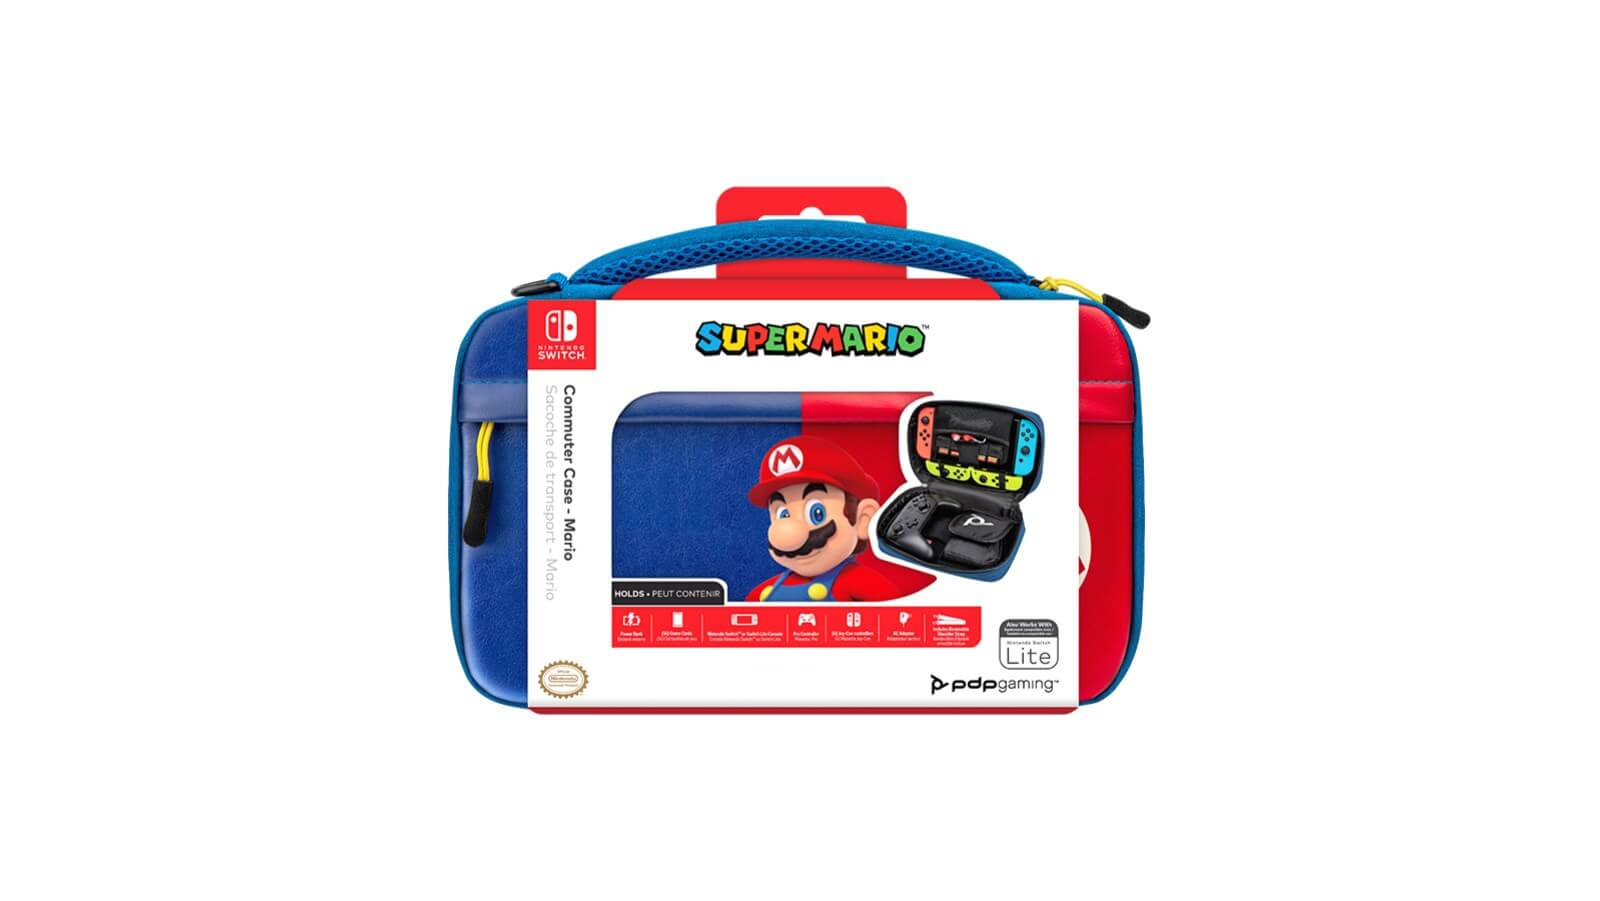 נרתיק נשיאה Commuter – Super Mario